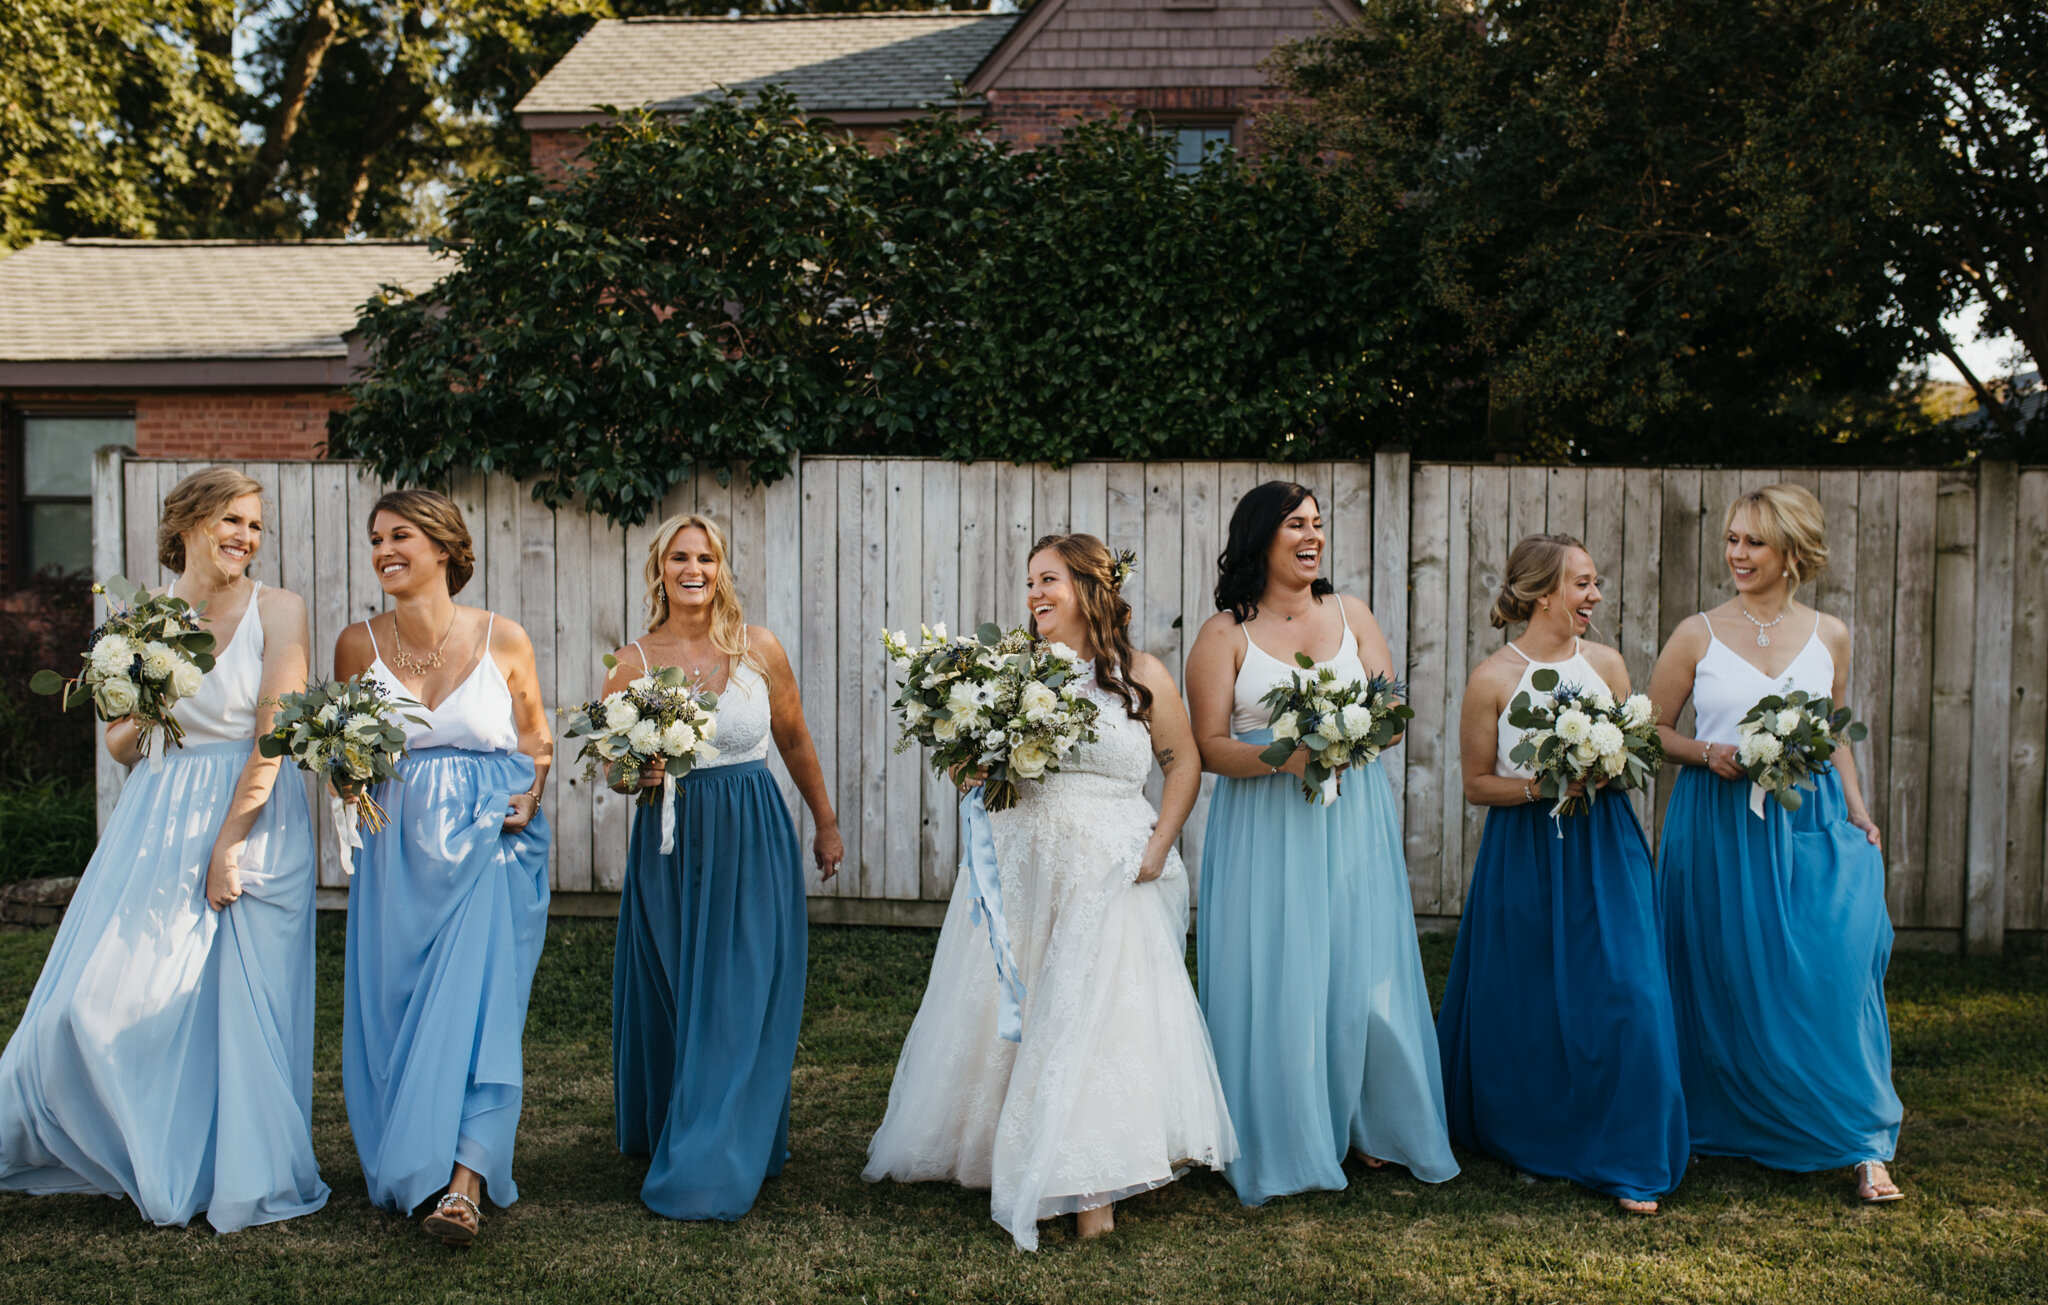 angela_jason_norfolk_wedding-64.jpg